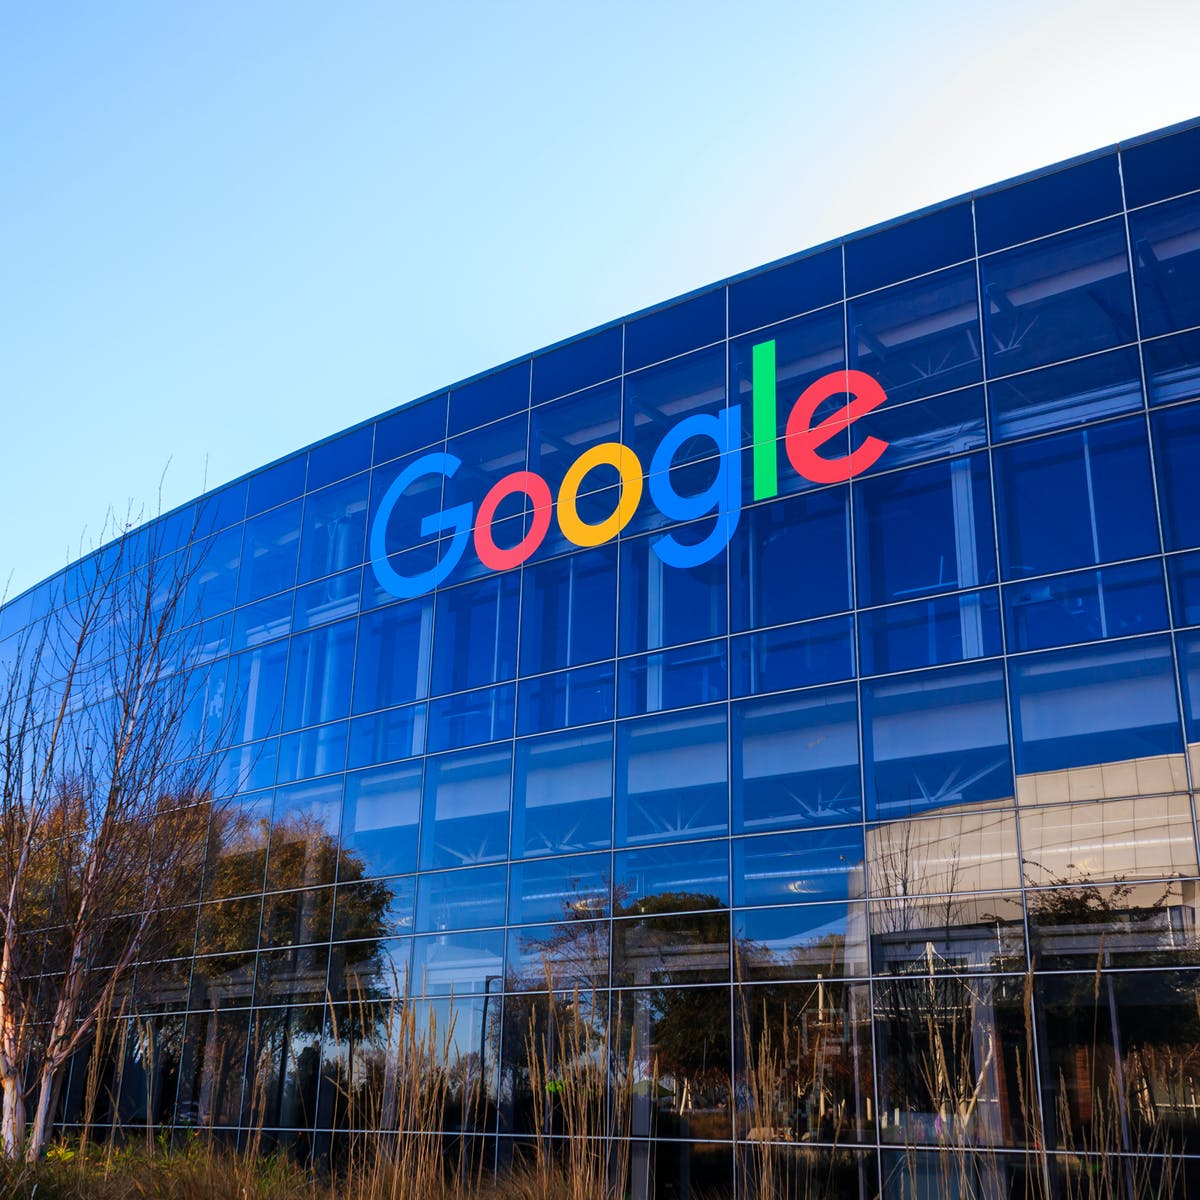 Google creates new method of tracking users